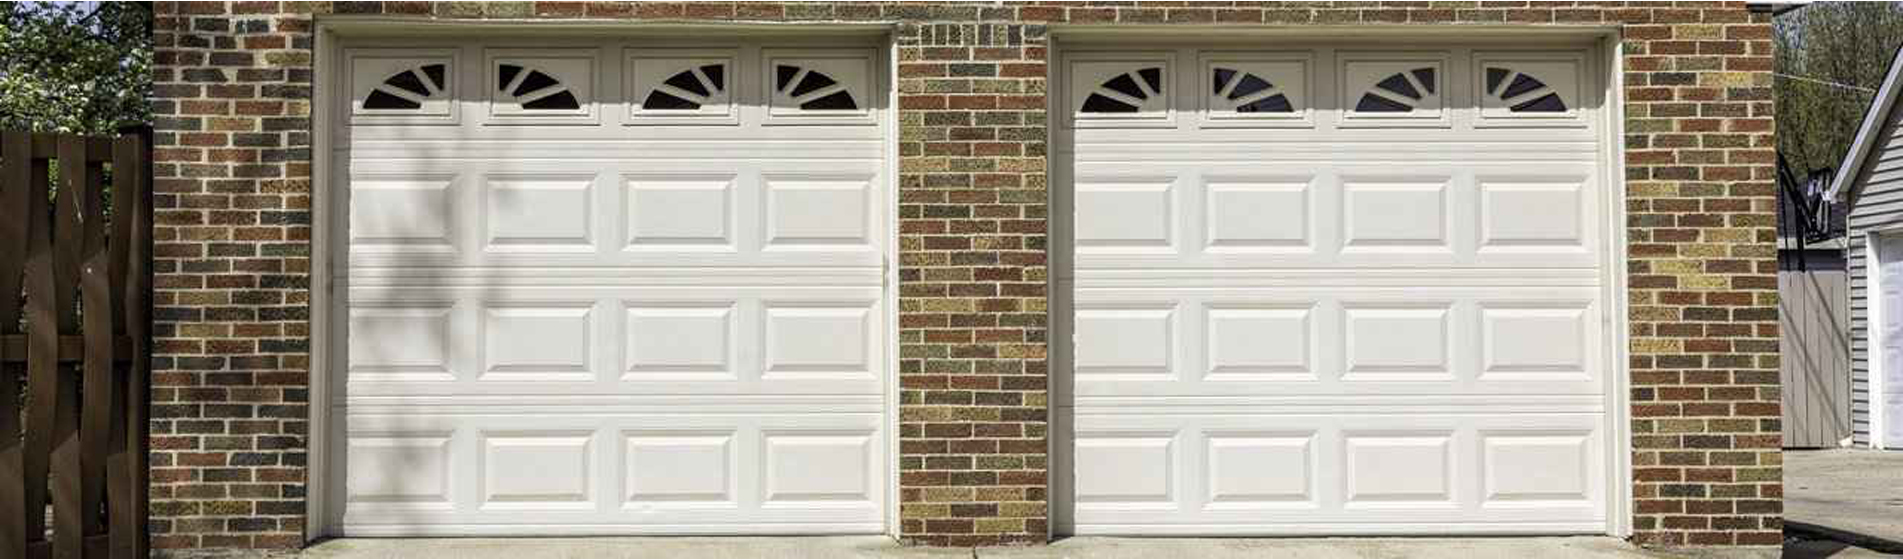 achat porte de garage alu Pertuis